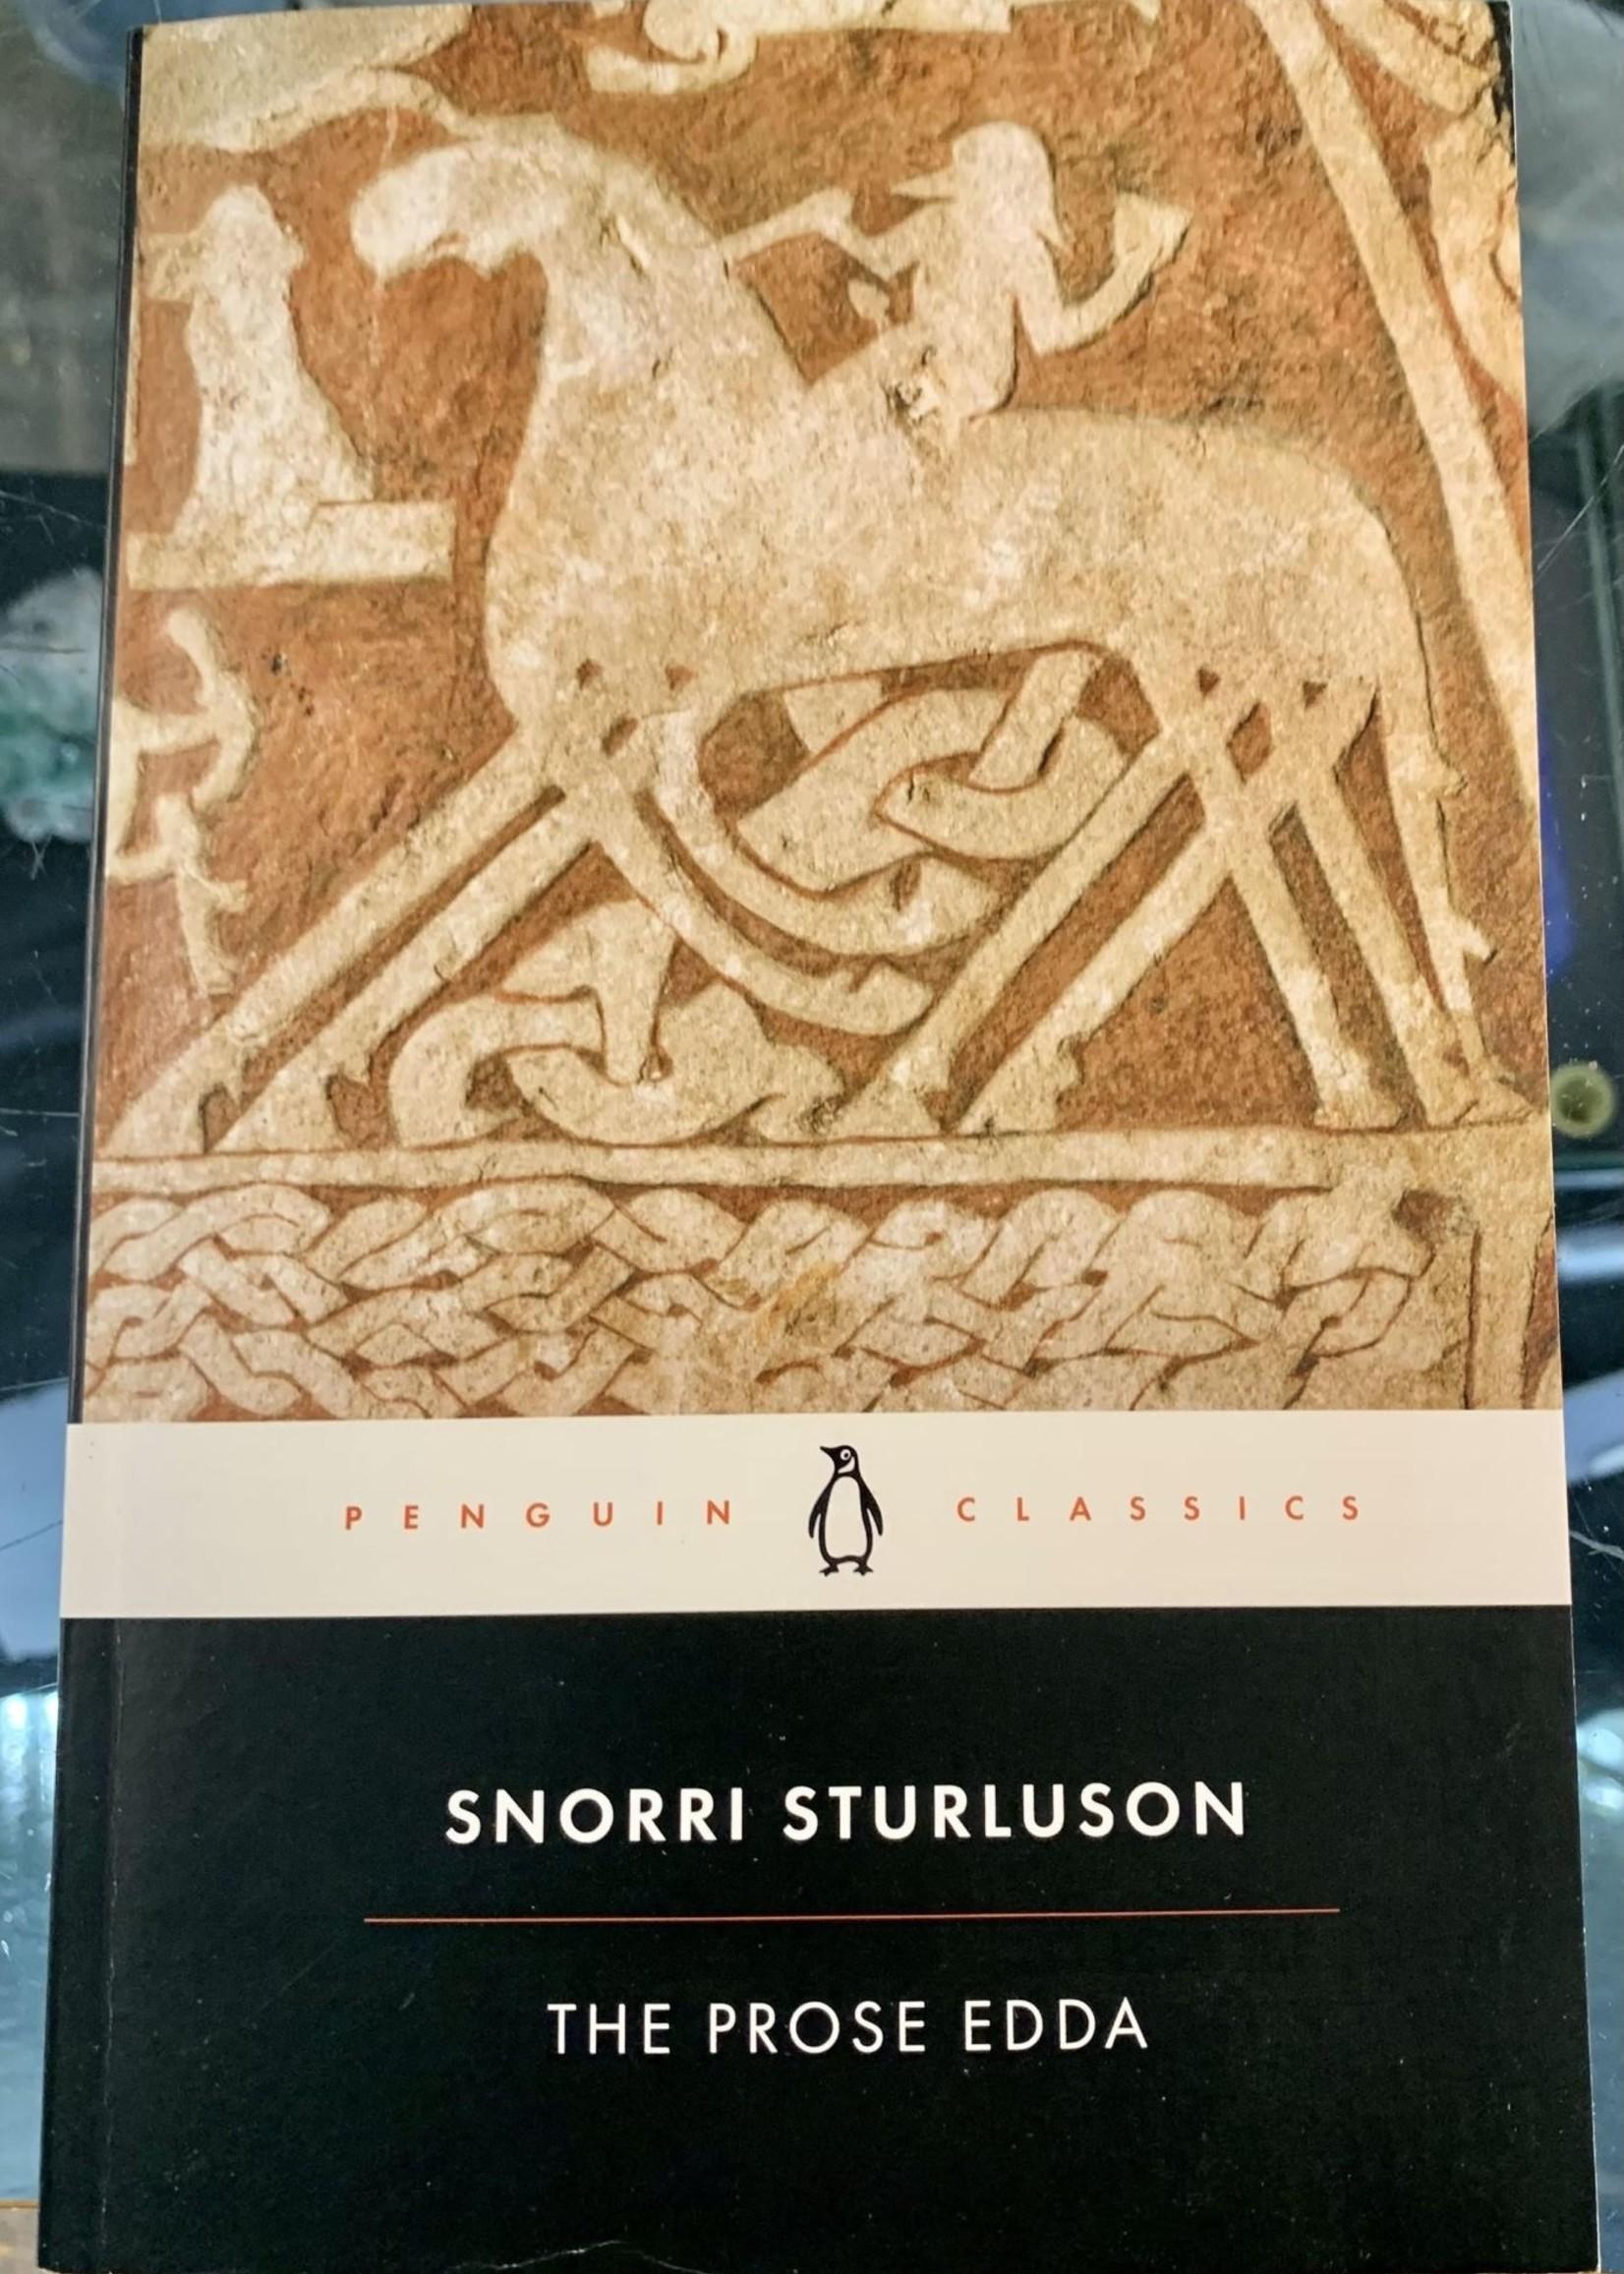 The Prose Edda TALES FROM NORSE MYTHOLOGY- By SNORRI STURLUSON Introduction by Jesse L. Byock Translated by Jesse L. Byock Notes by Jesse L. Byock